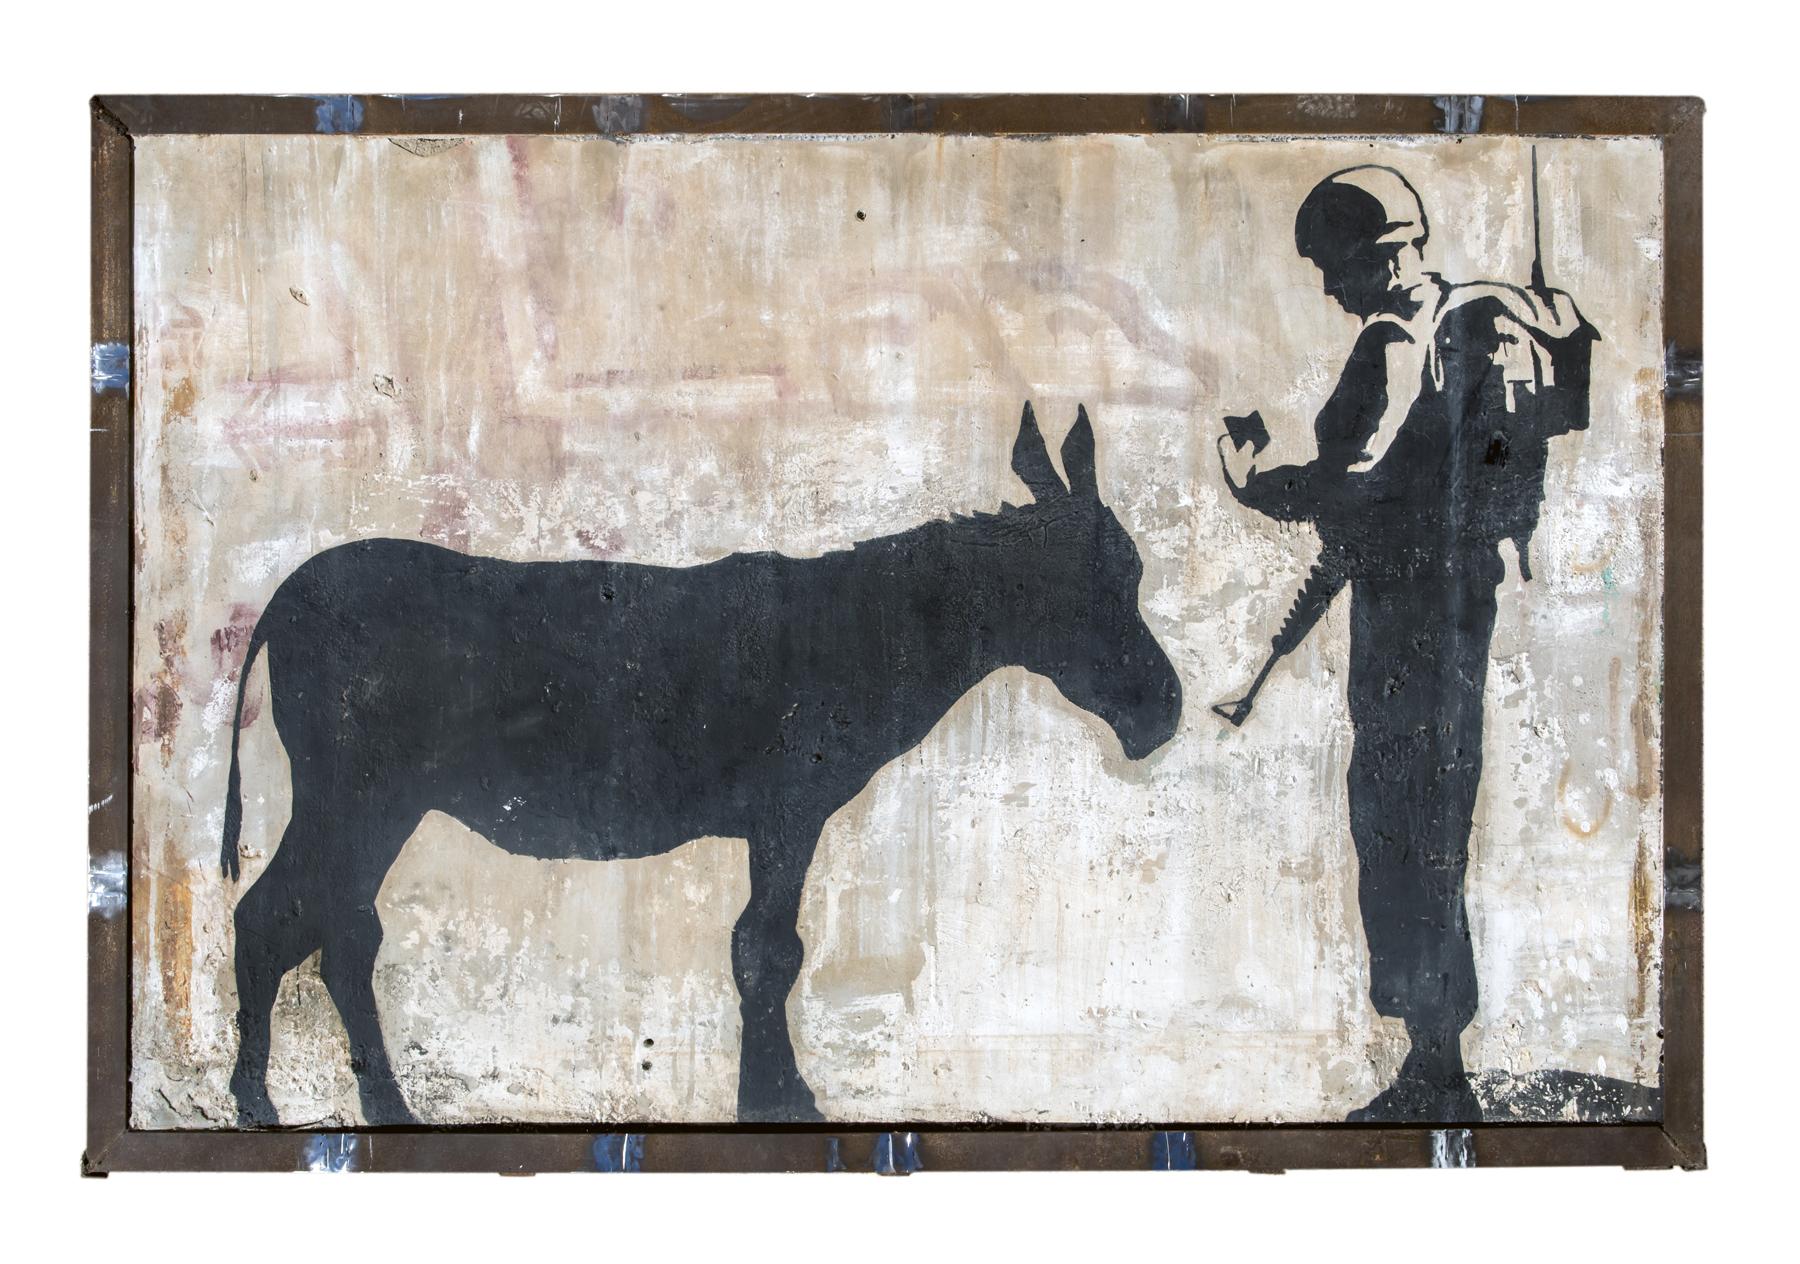 Banksy, la Palestina e la street art in vendita, in un documentario su Sky Arte